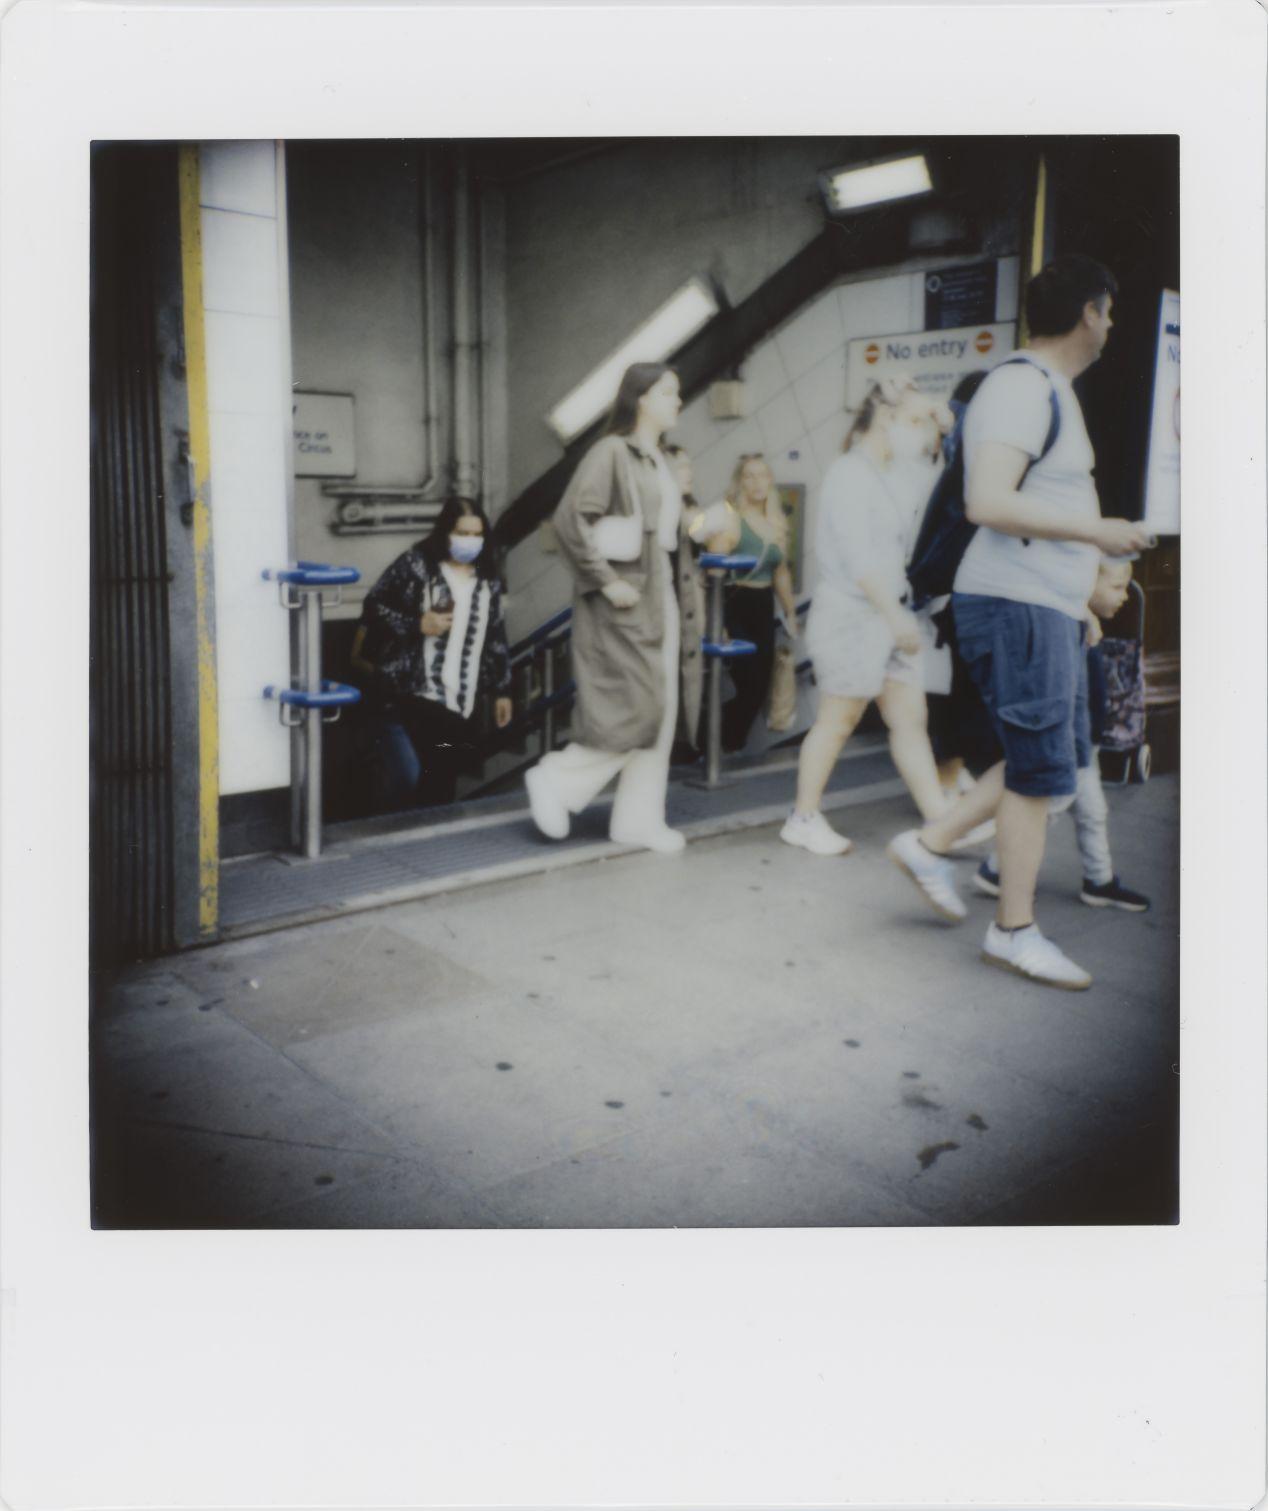 Photograph 2: Oxford Circus Underground Station, Sunday 1st. August 2021.